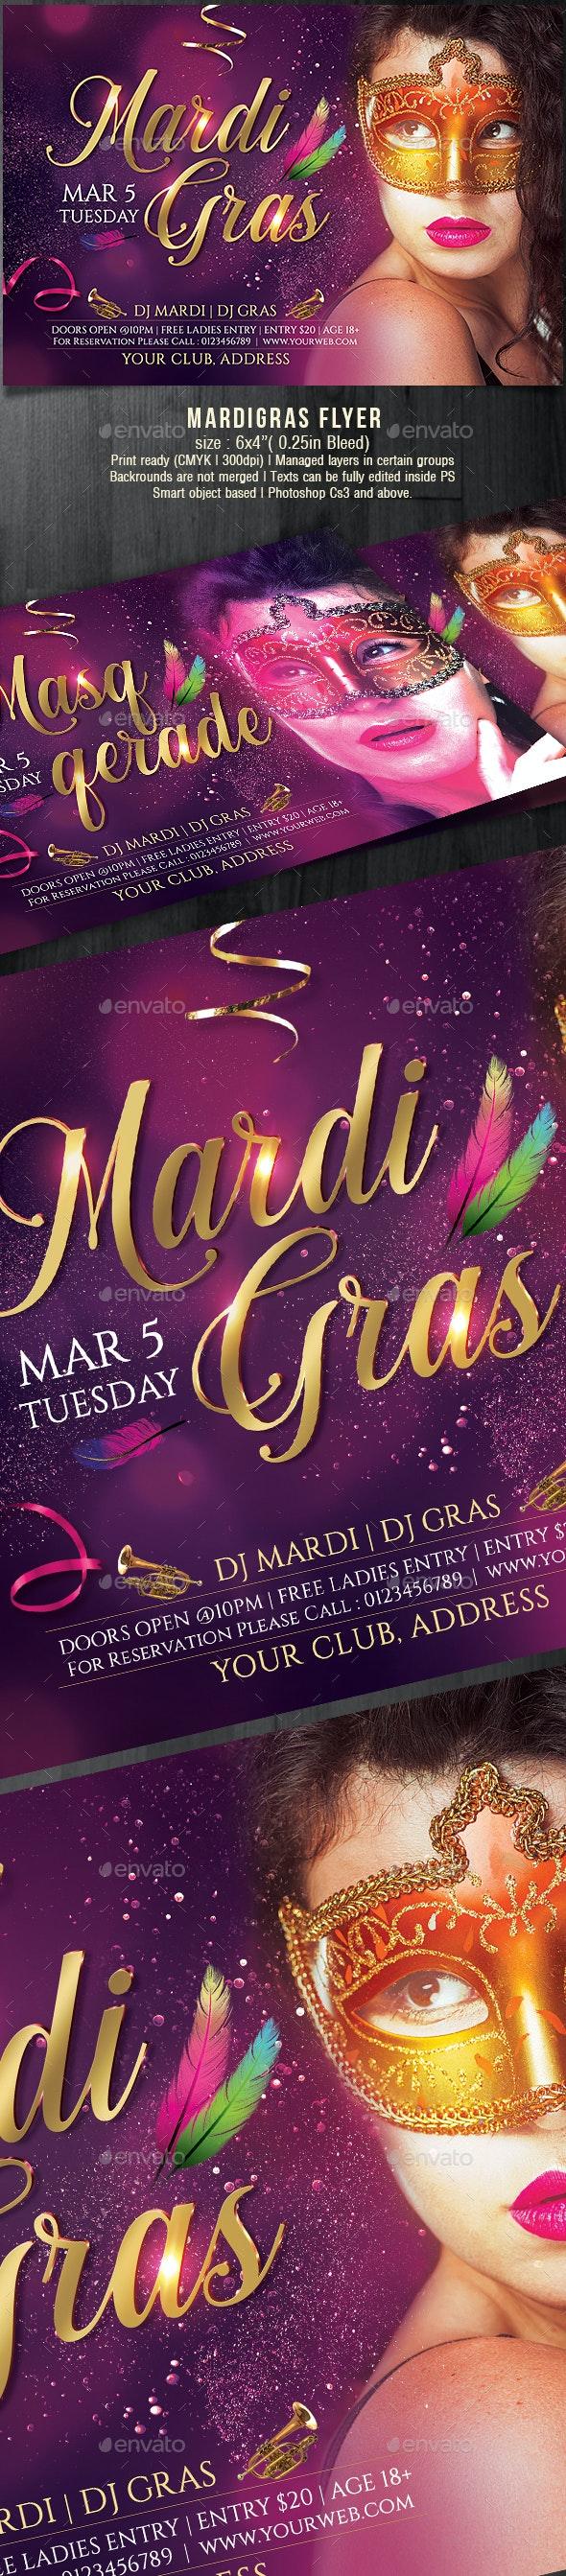 Masquerade Mardi Gras Party Flyer - Holidays Events